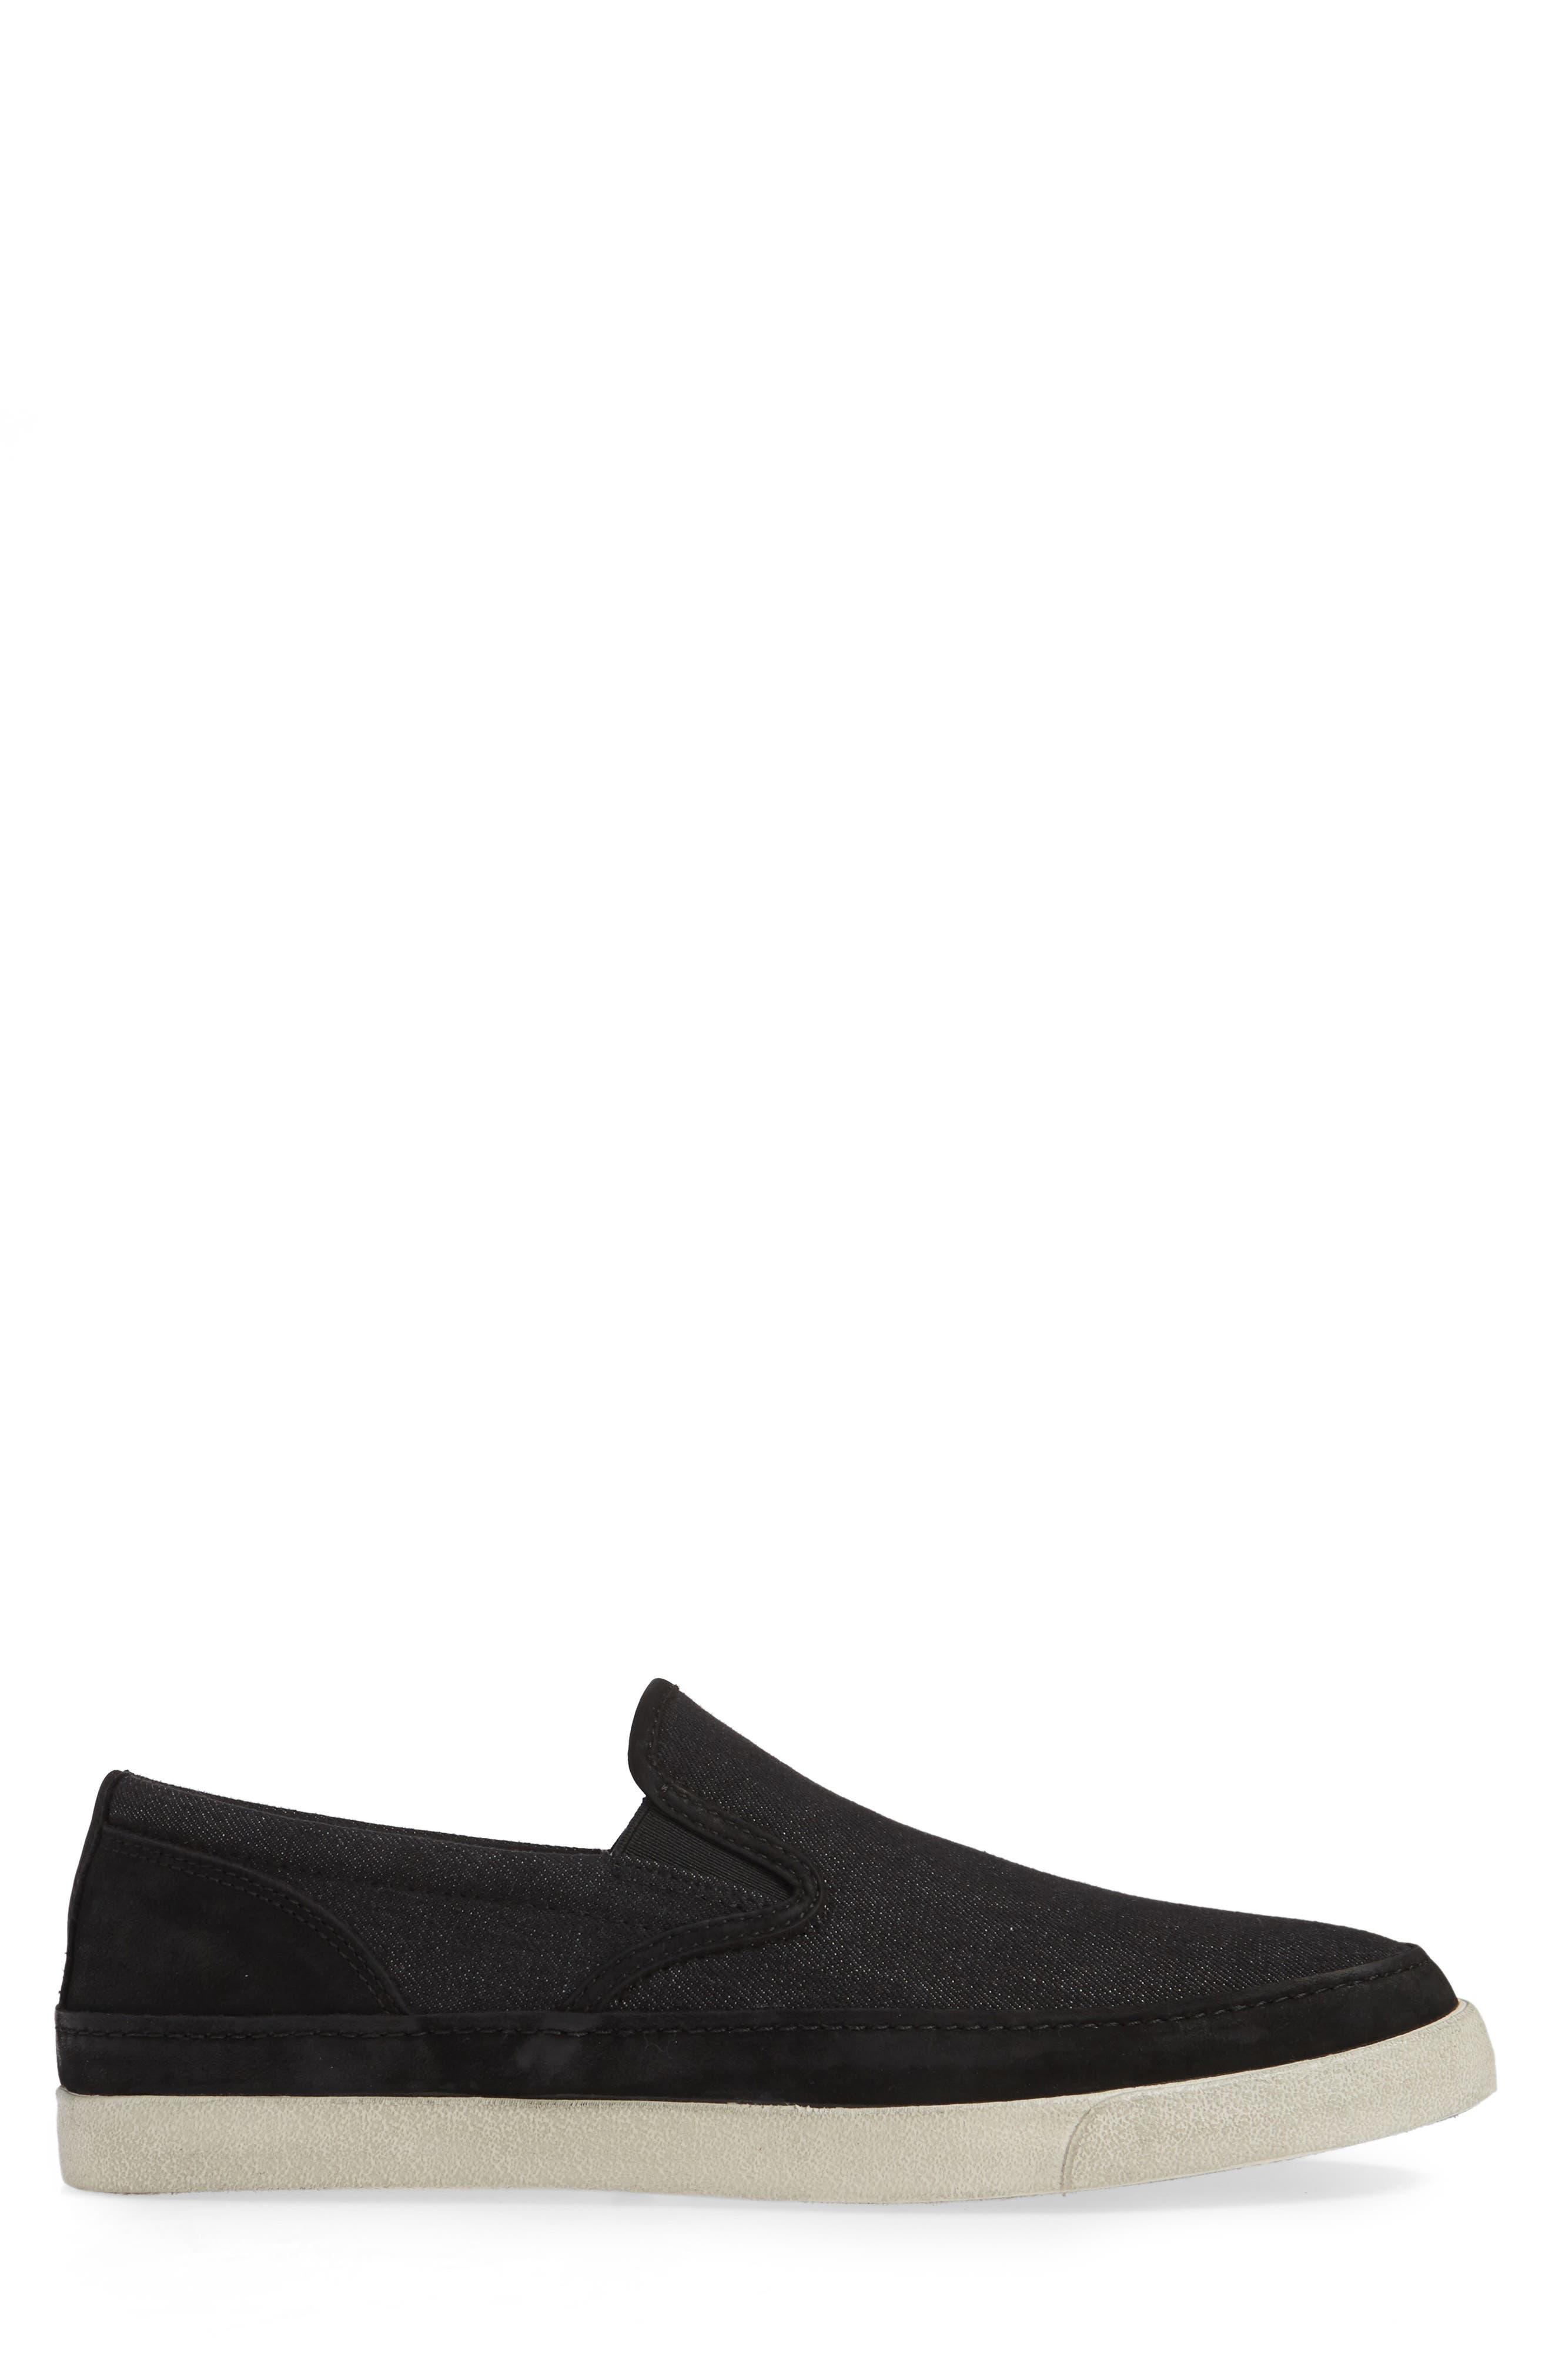 JOHN VARVATOS STAR USA, Jet Canvas Slip-On Sneaker, Alternate thumbnail 3, color, MINERAL BLK